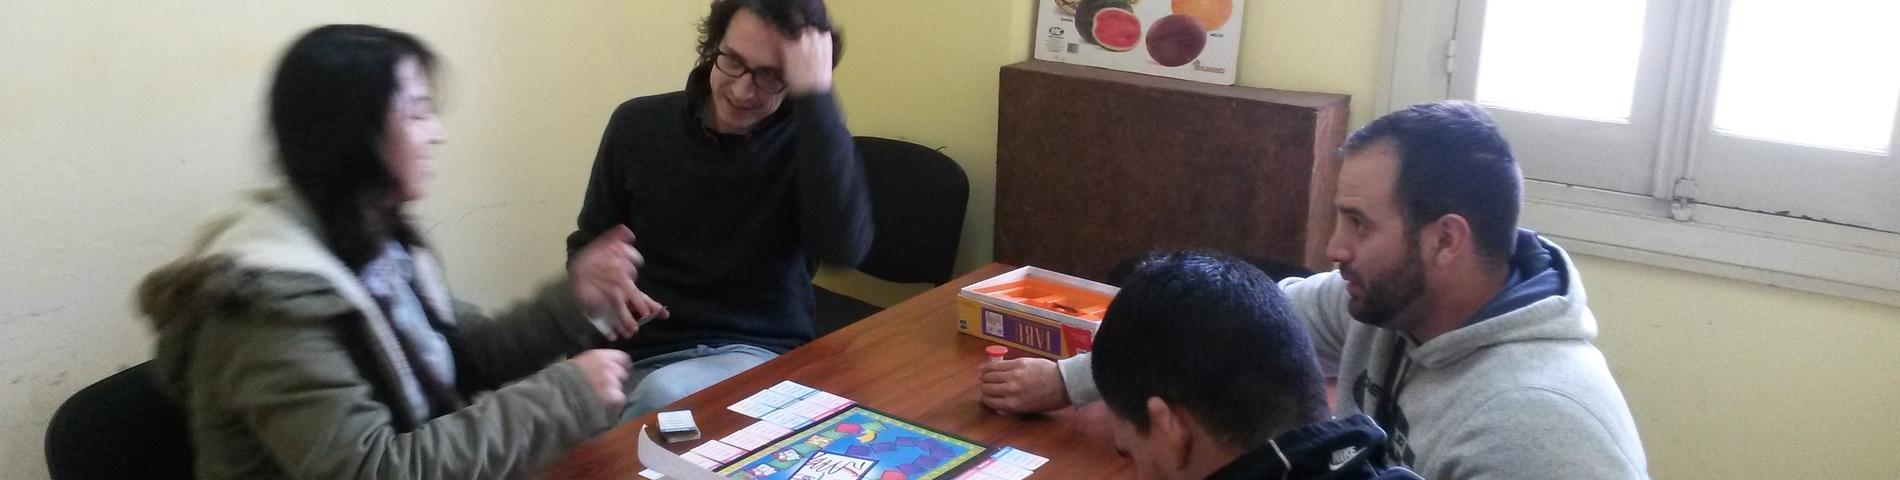 Centro de Enseñanza de Español La Herradura resim 1